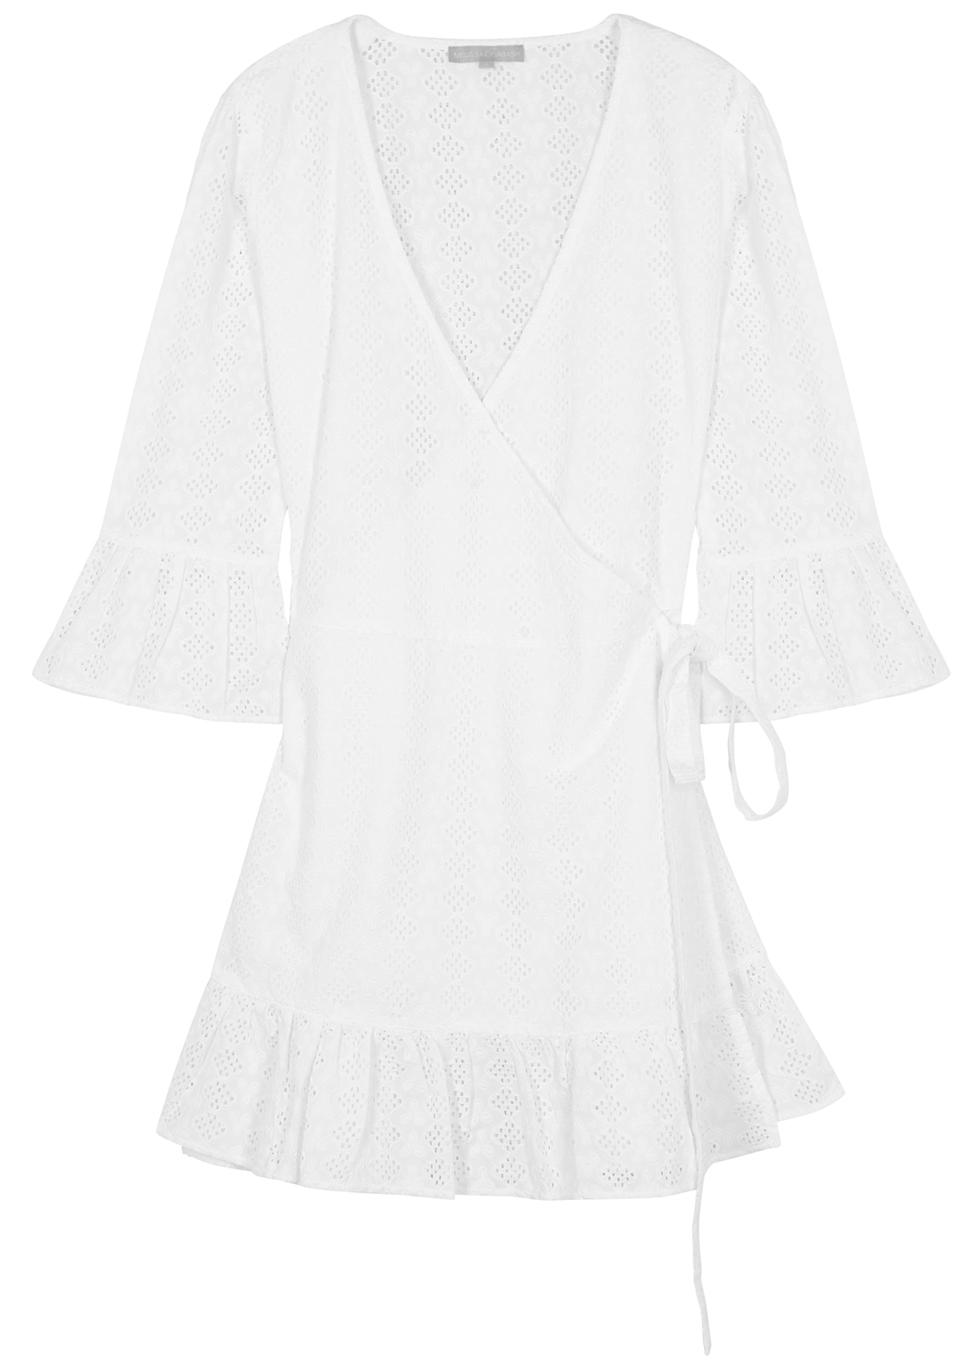 007ac14b6c3c27 Women's Designer Cover-Ups, Kimonos & Kaftans - Harvey Nichols